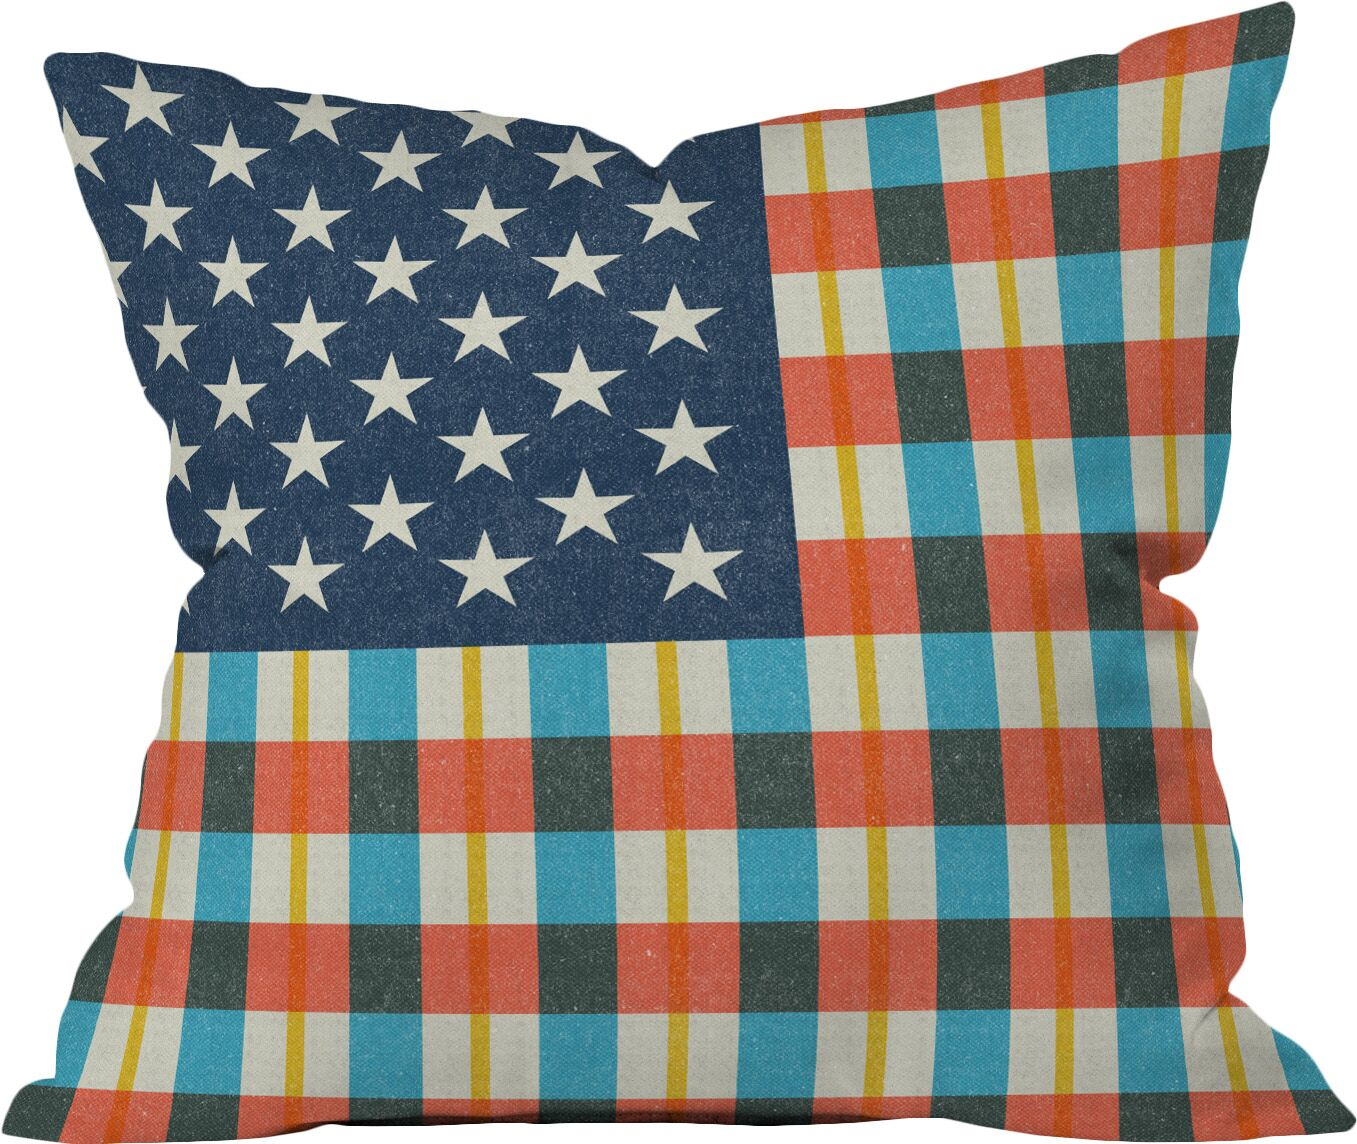 Plaid Flag Fleece Stars and Stripes Throw Pillow Size: 18